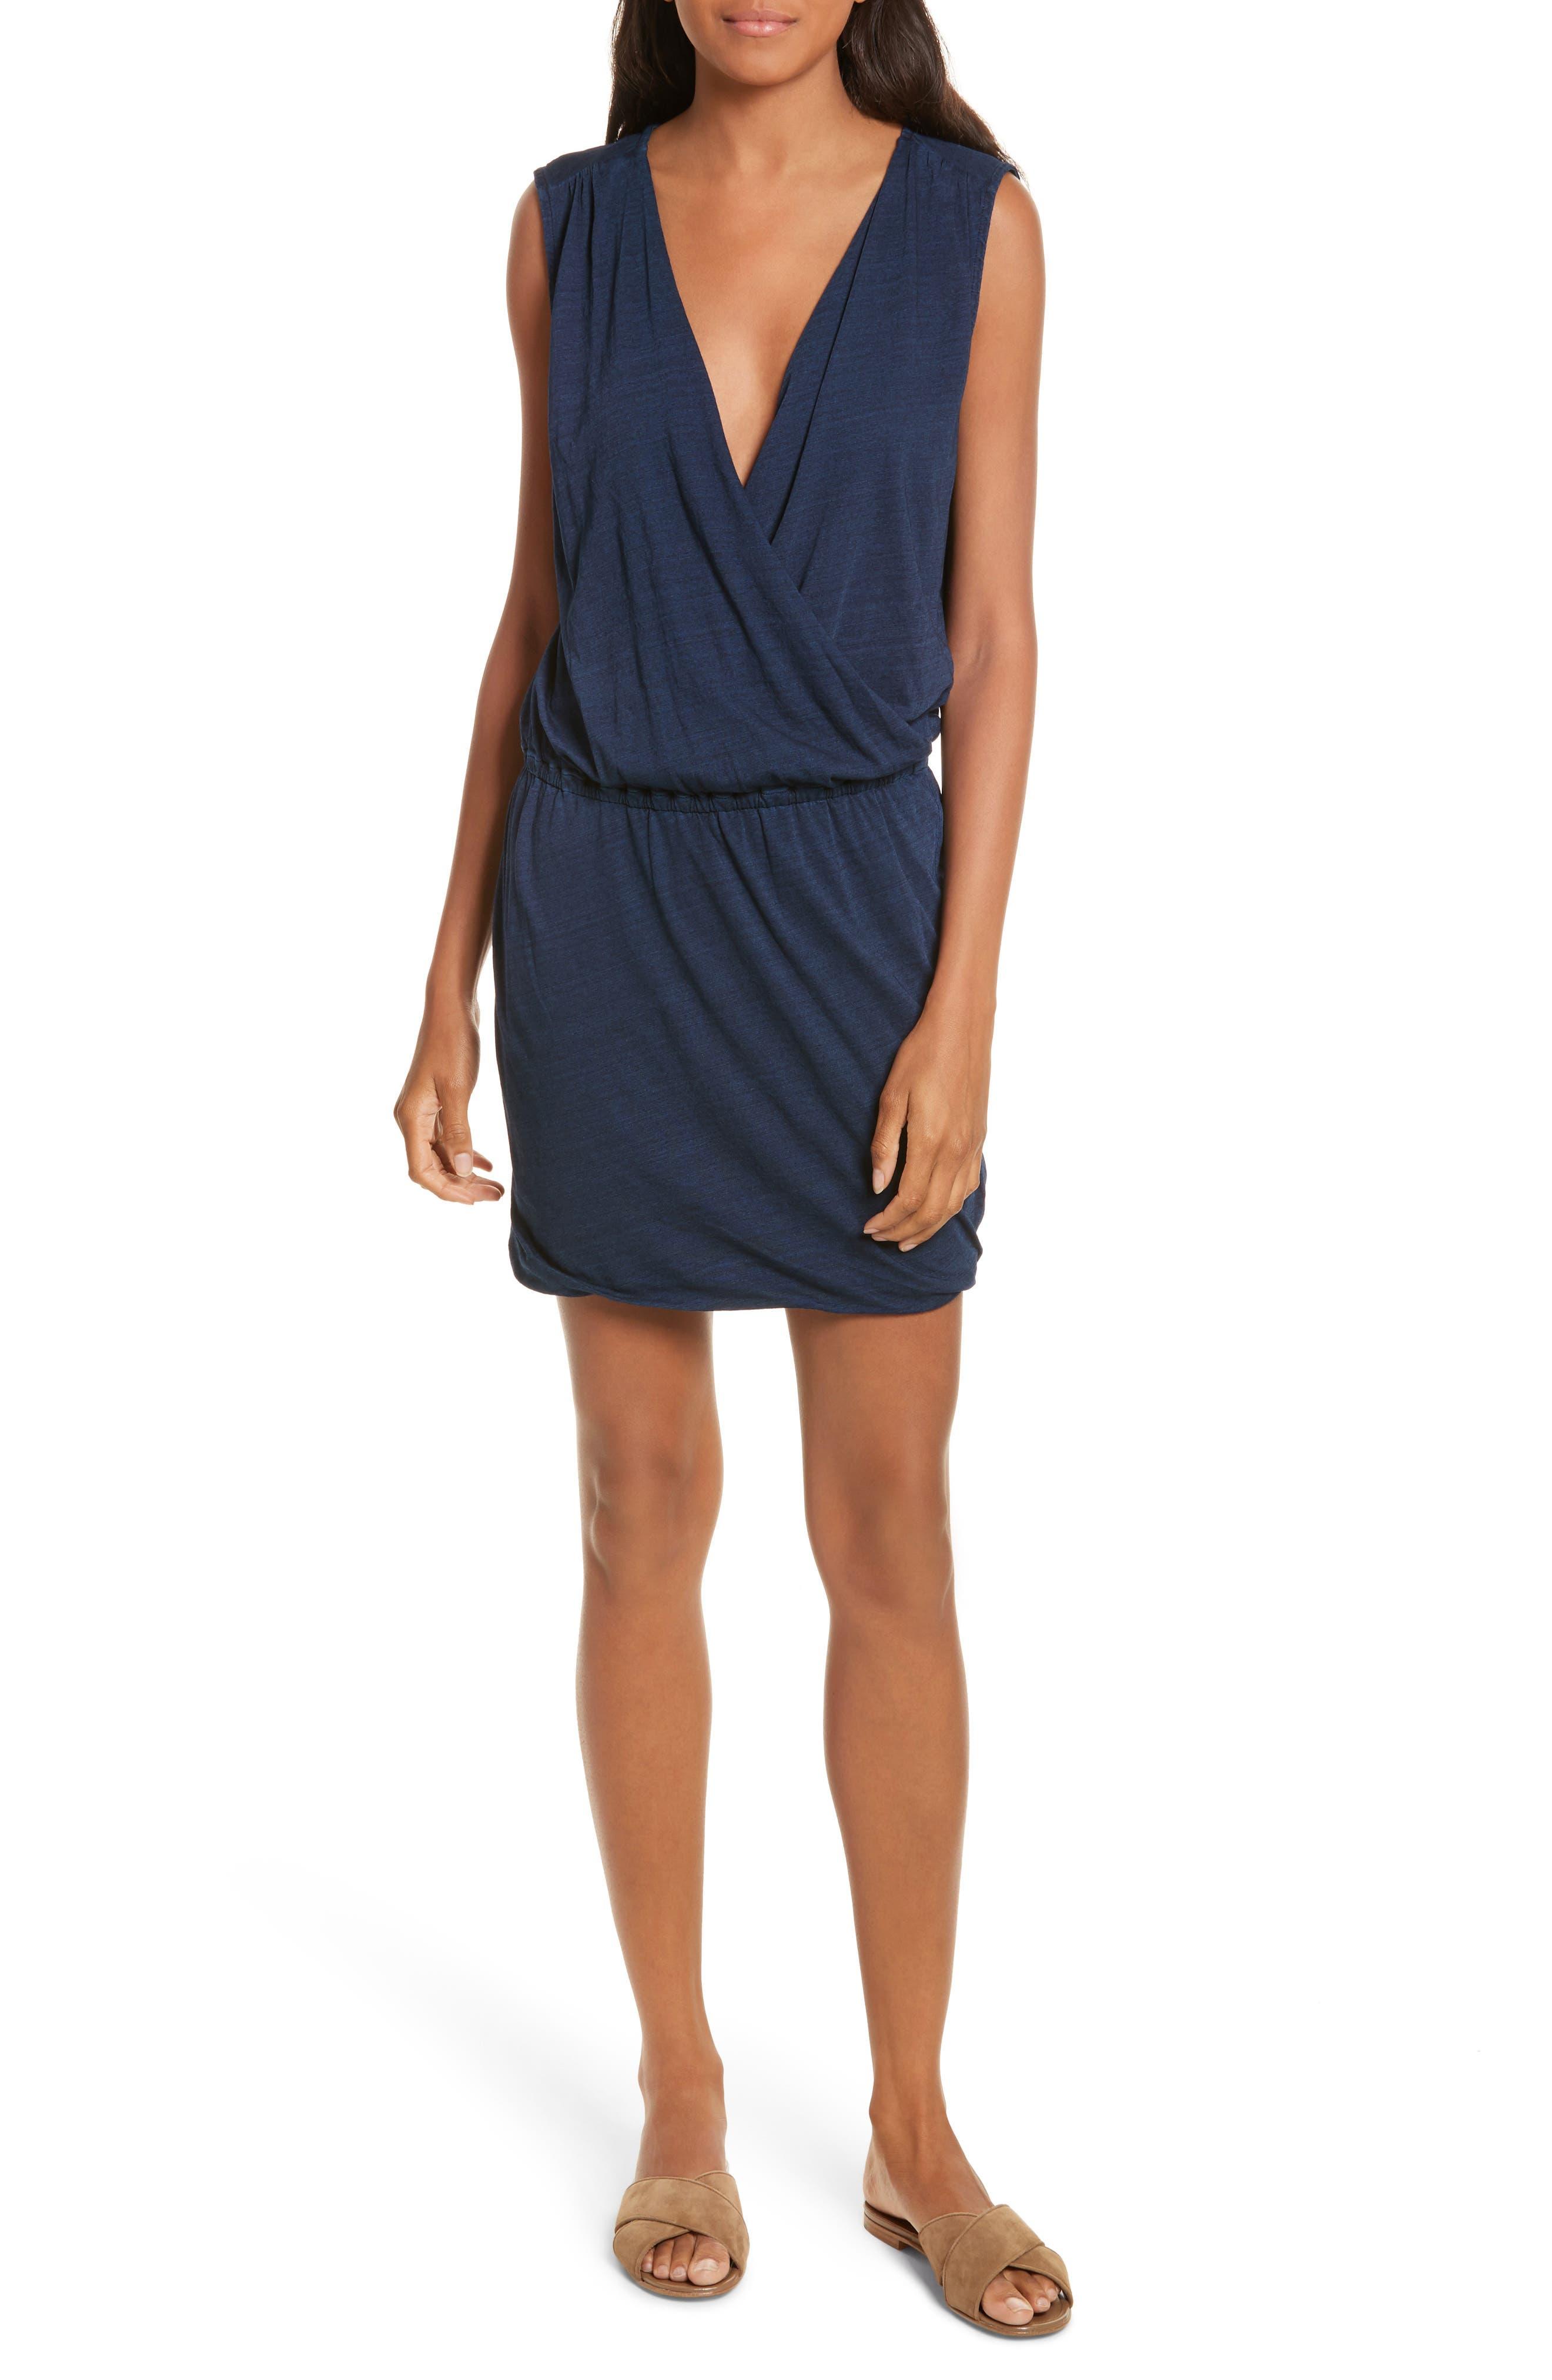 Faylen Blouson Knit Dress,                             Main thumbnail 1, color,                             487